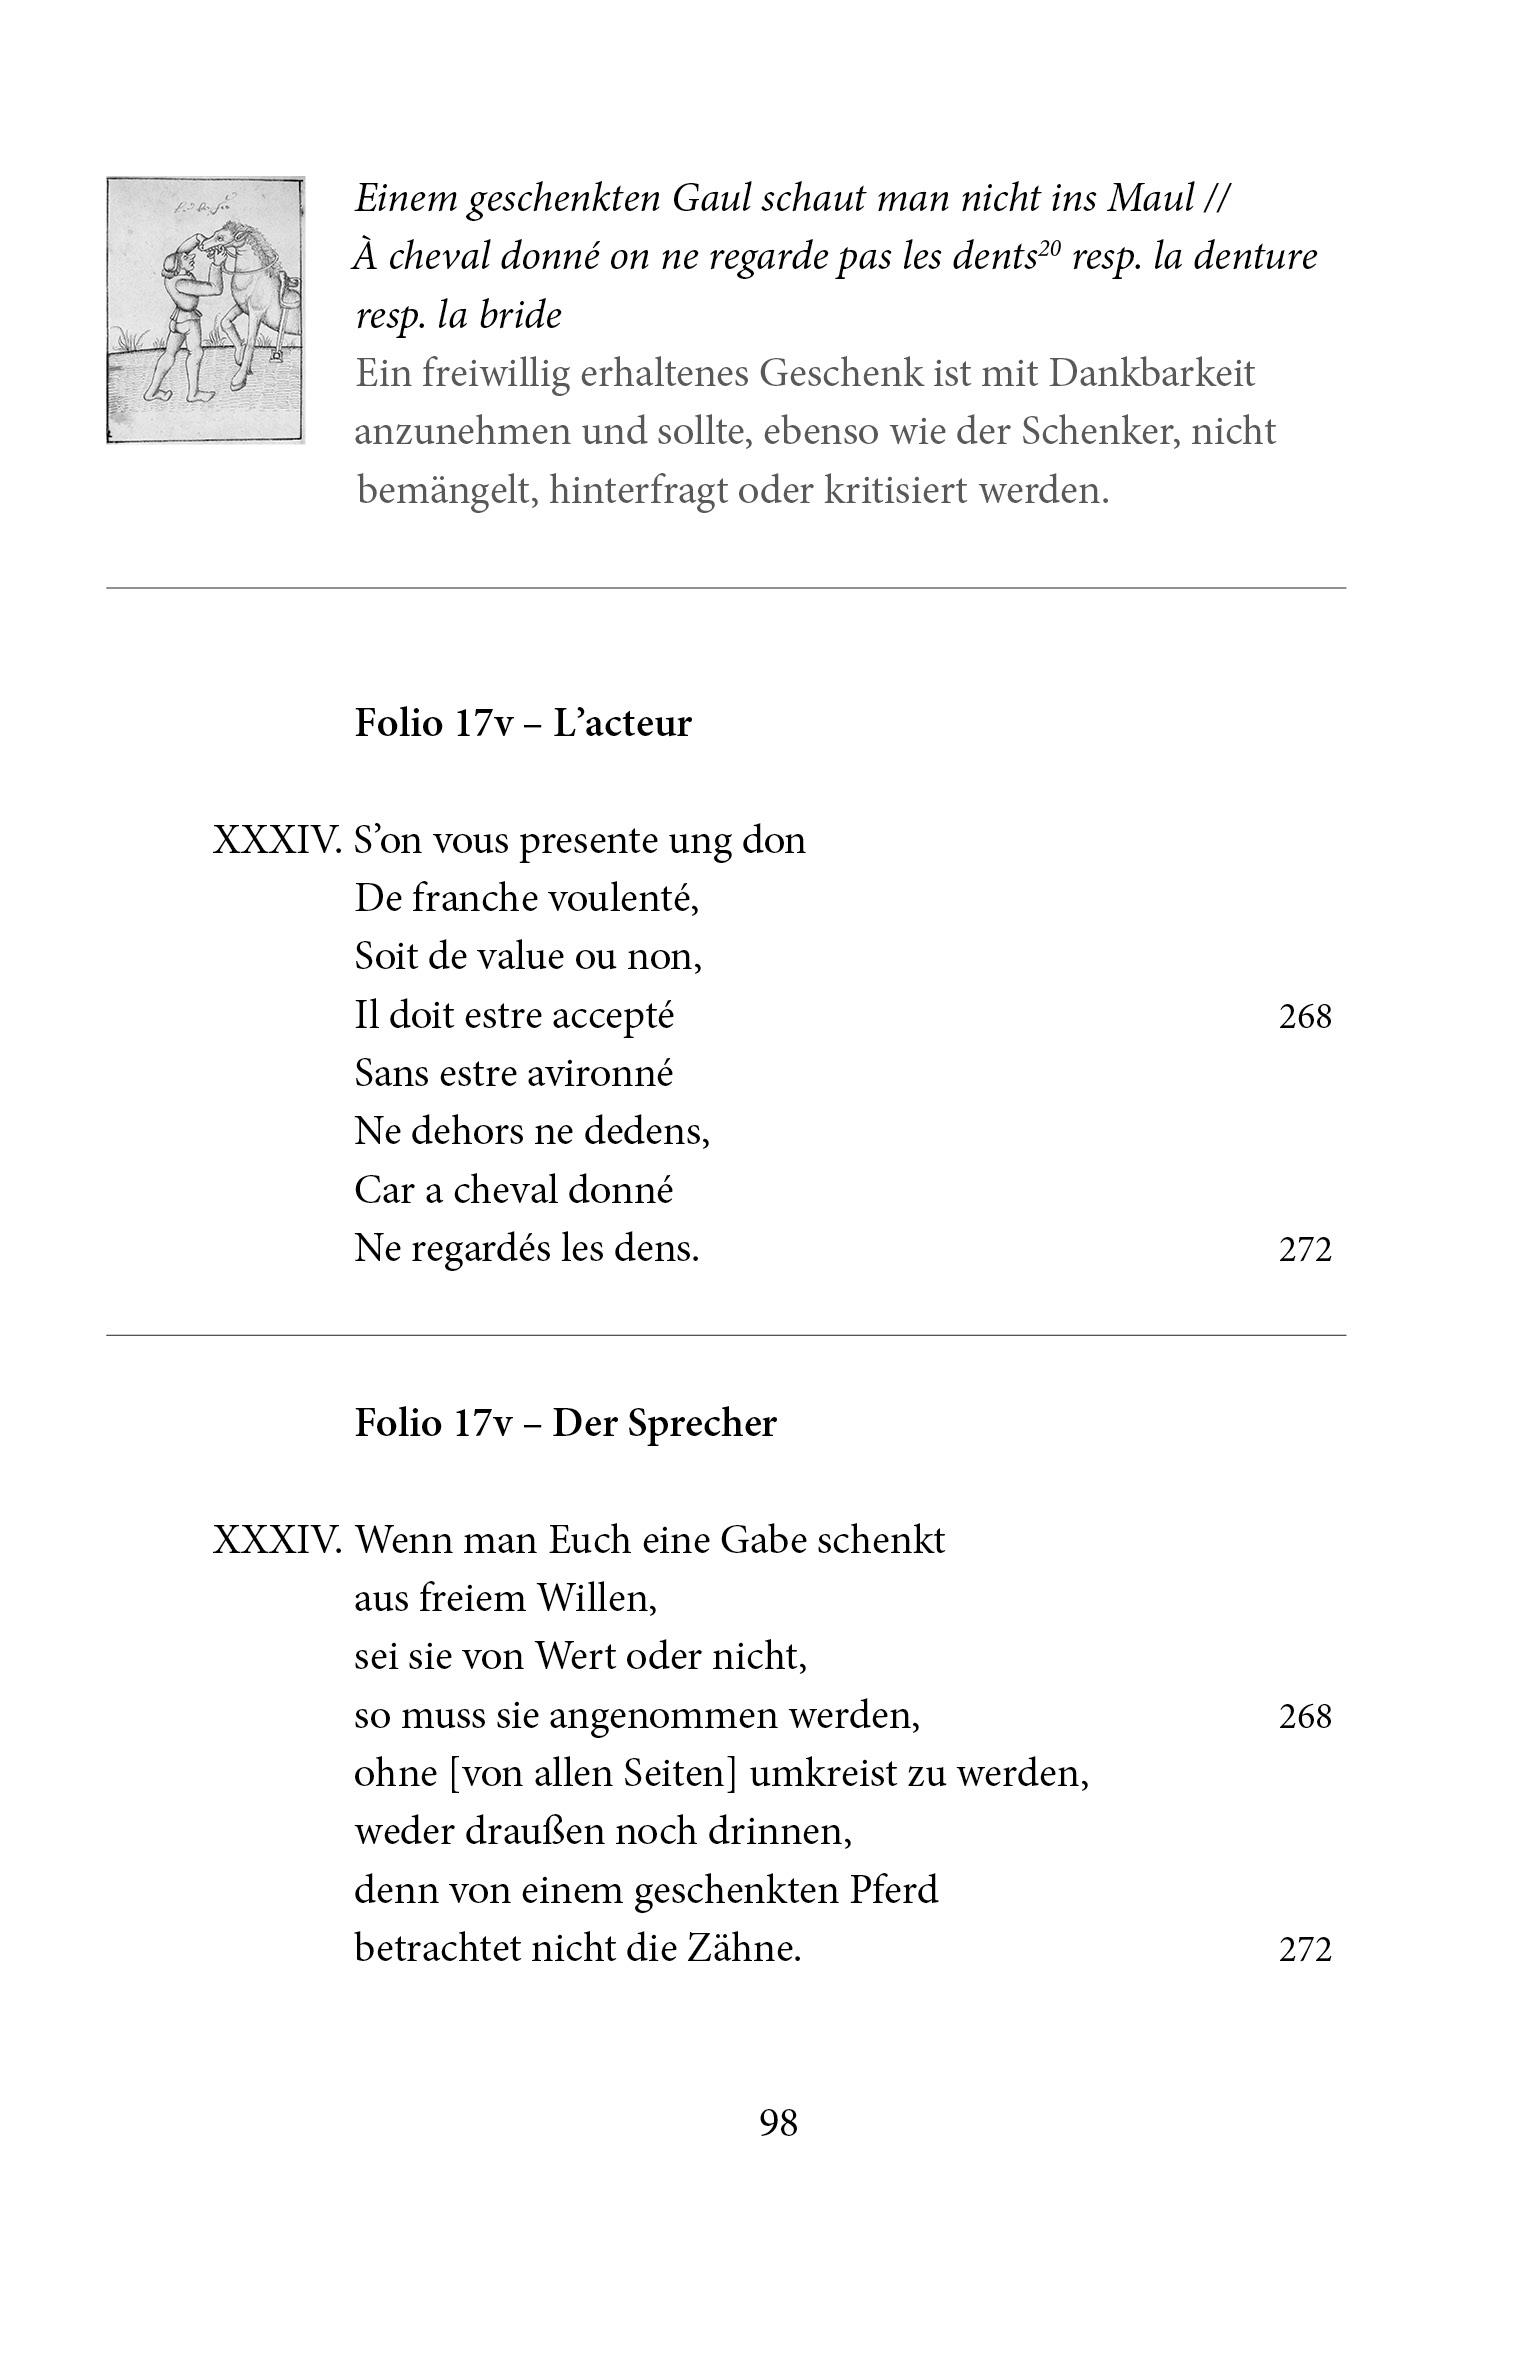 Kunstbuch-Edition: Proverbes en rimes, Begleitband S. 98